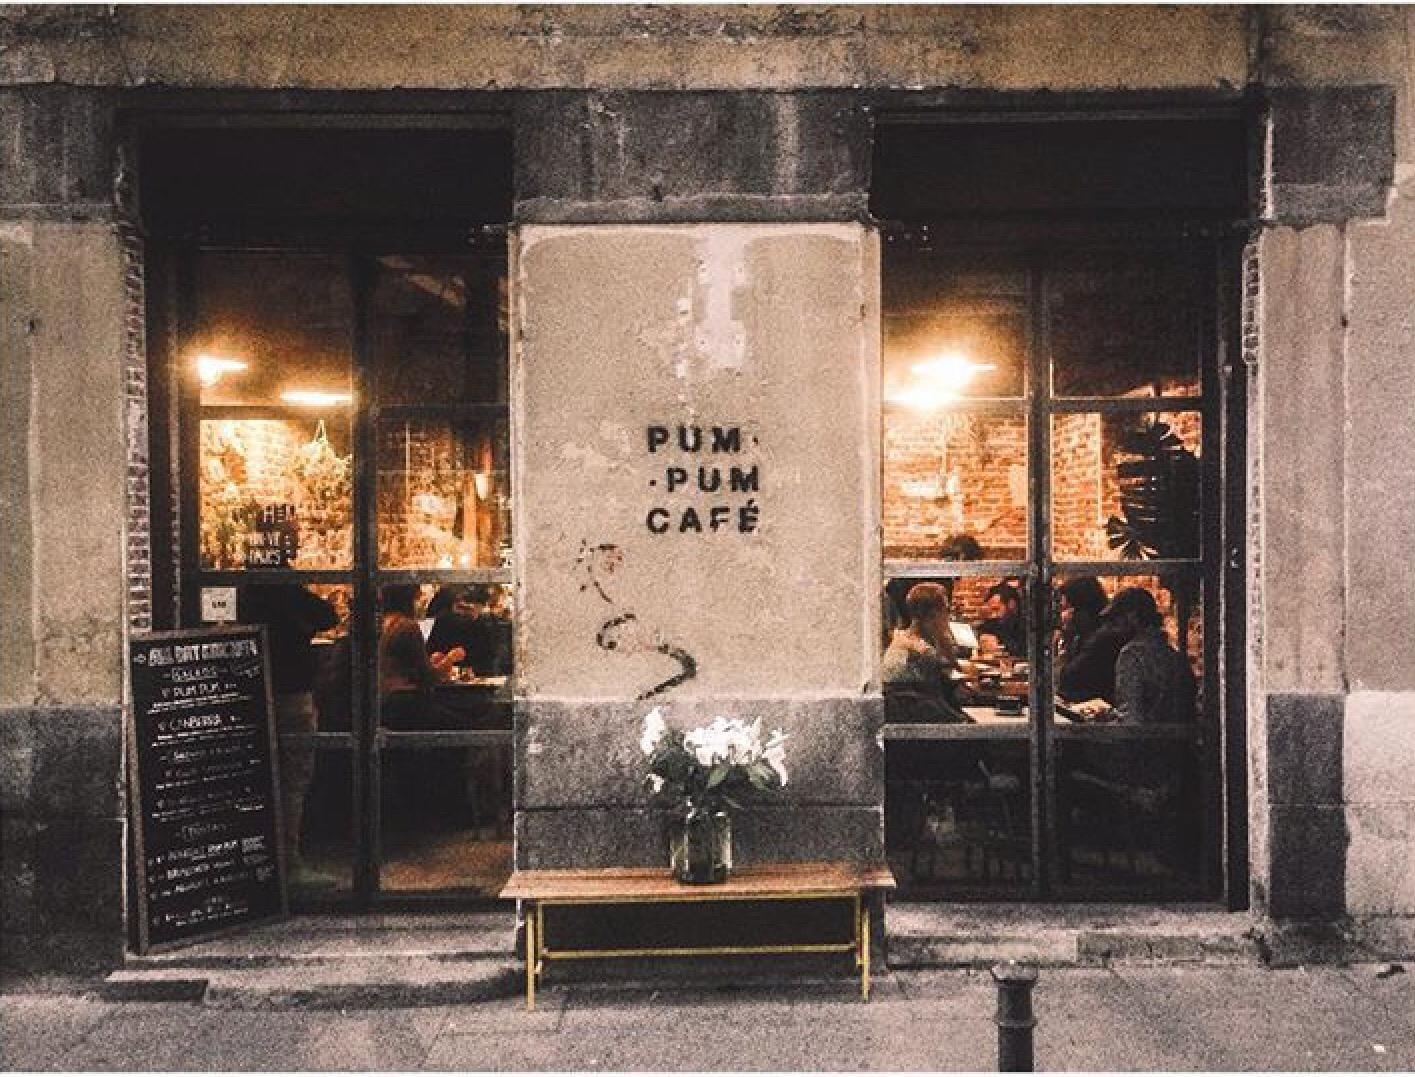 Pum Pum Café: A Work-Friendly Place in Madrid